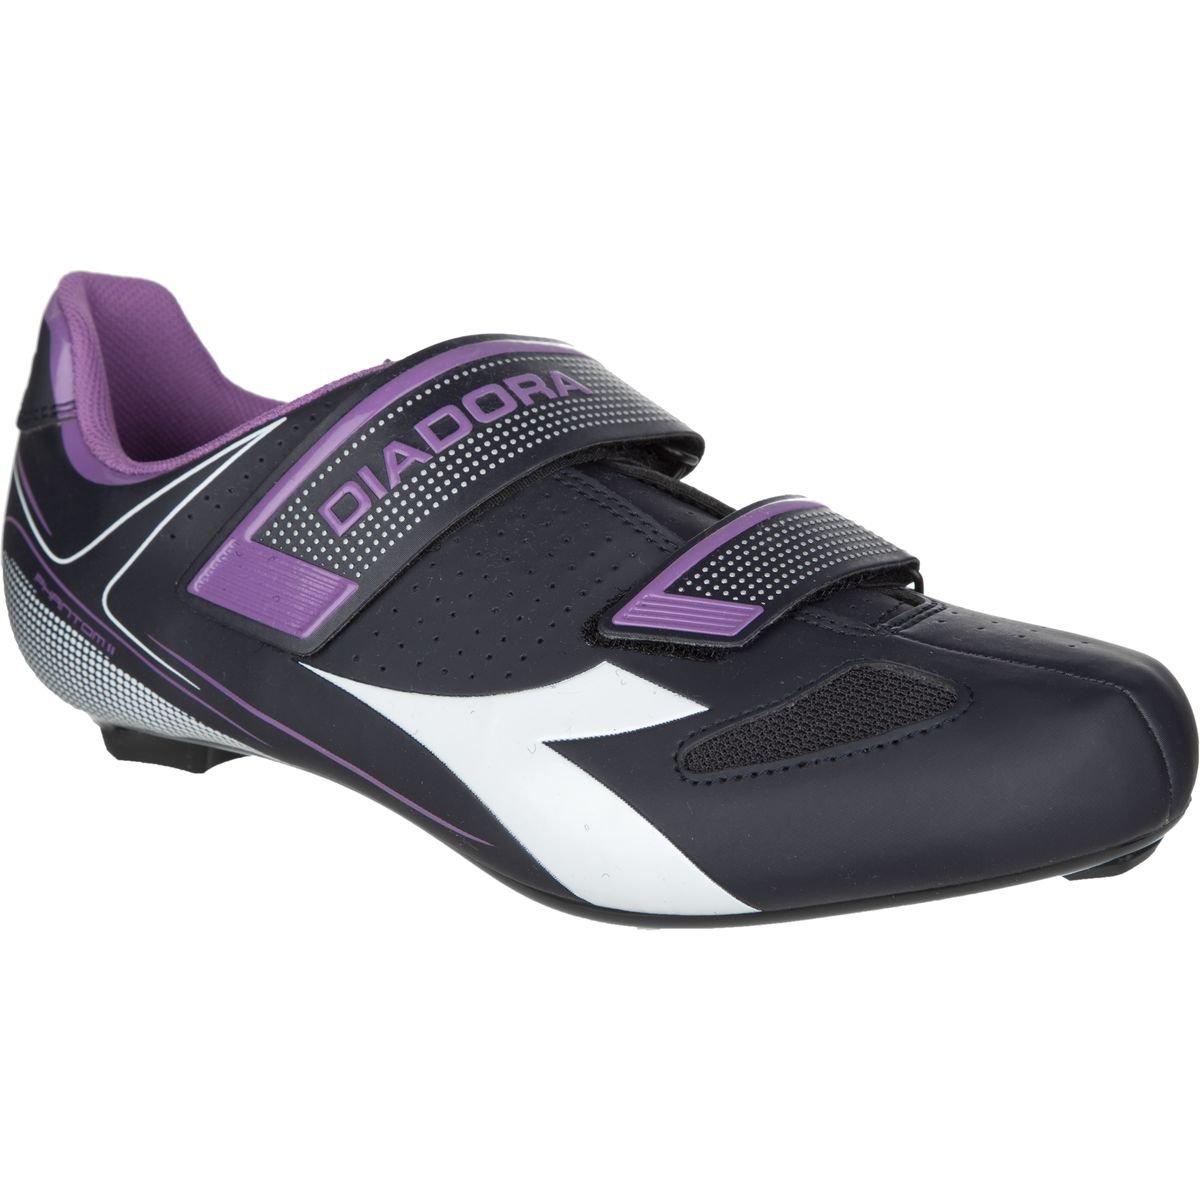 Diadora Phantom II Cycling Shoes - Women's Dk Smoke/White/Violet Orchid Iris, 40.0